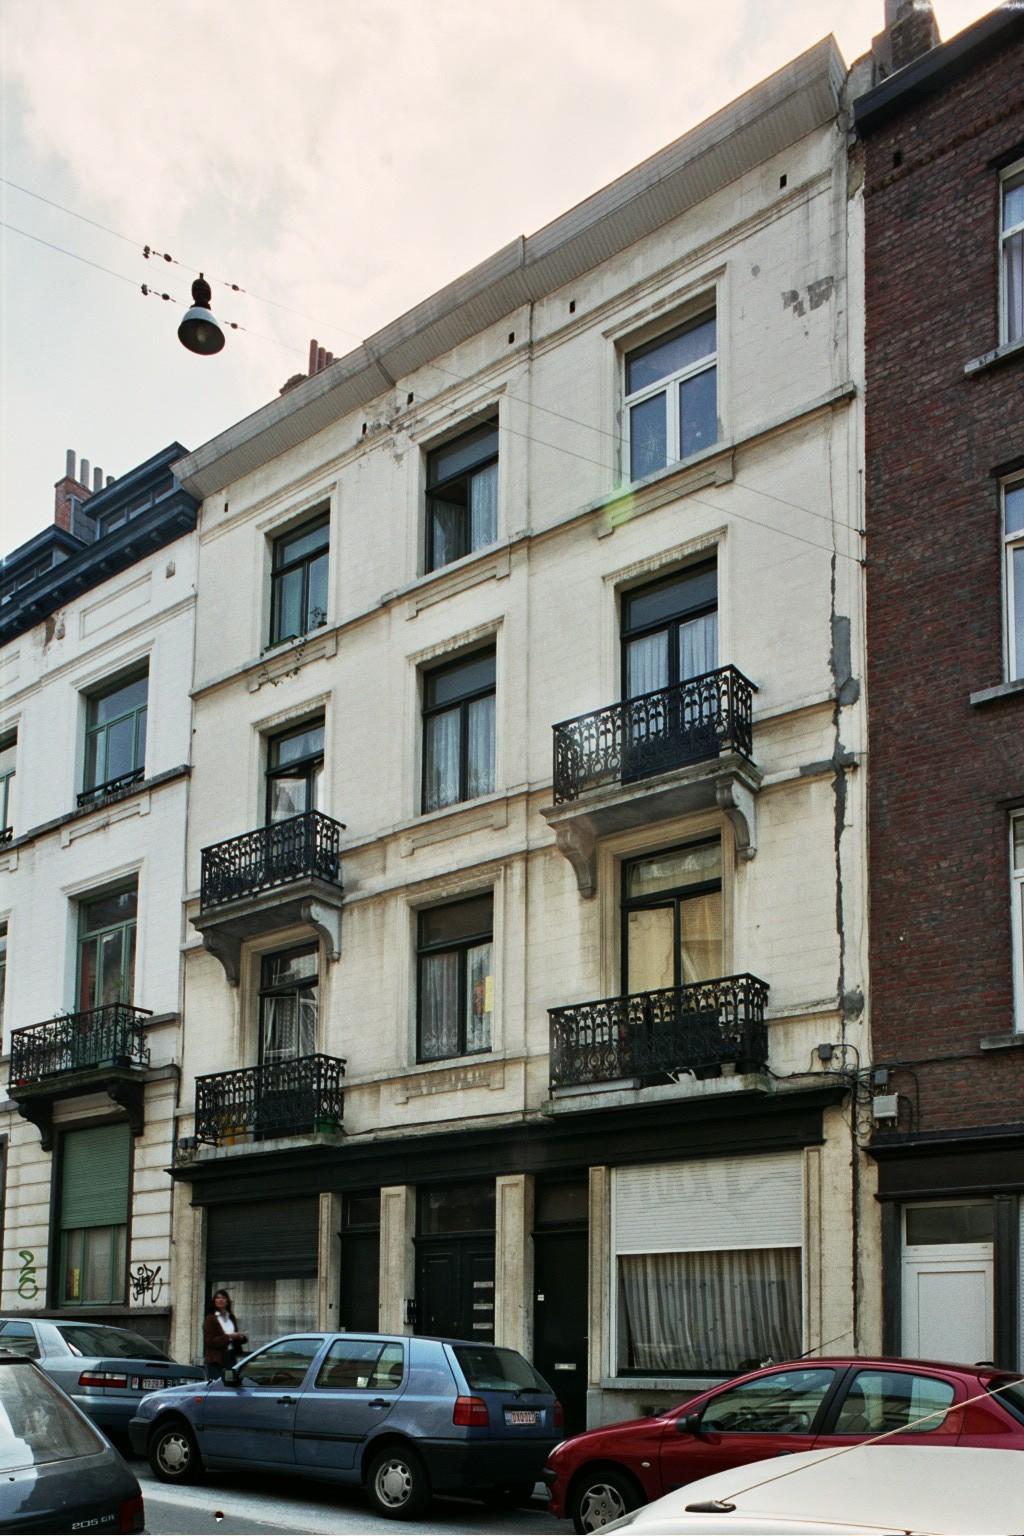 Witte-Bergstraat 3-3a-3b., 2004